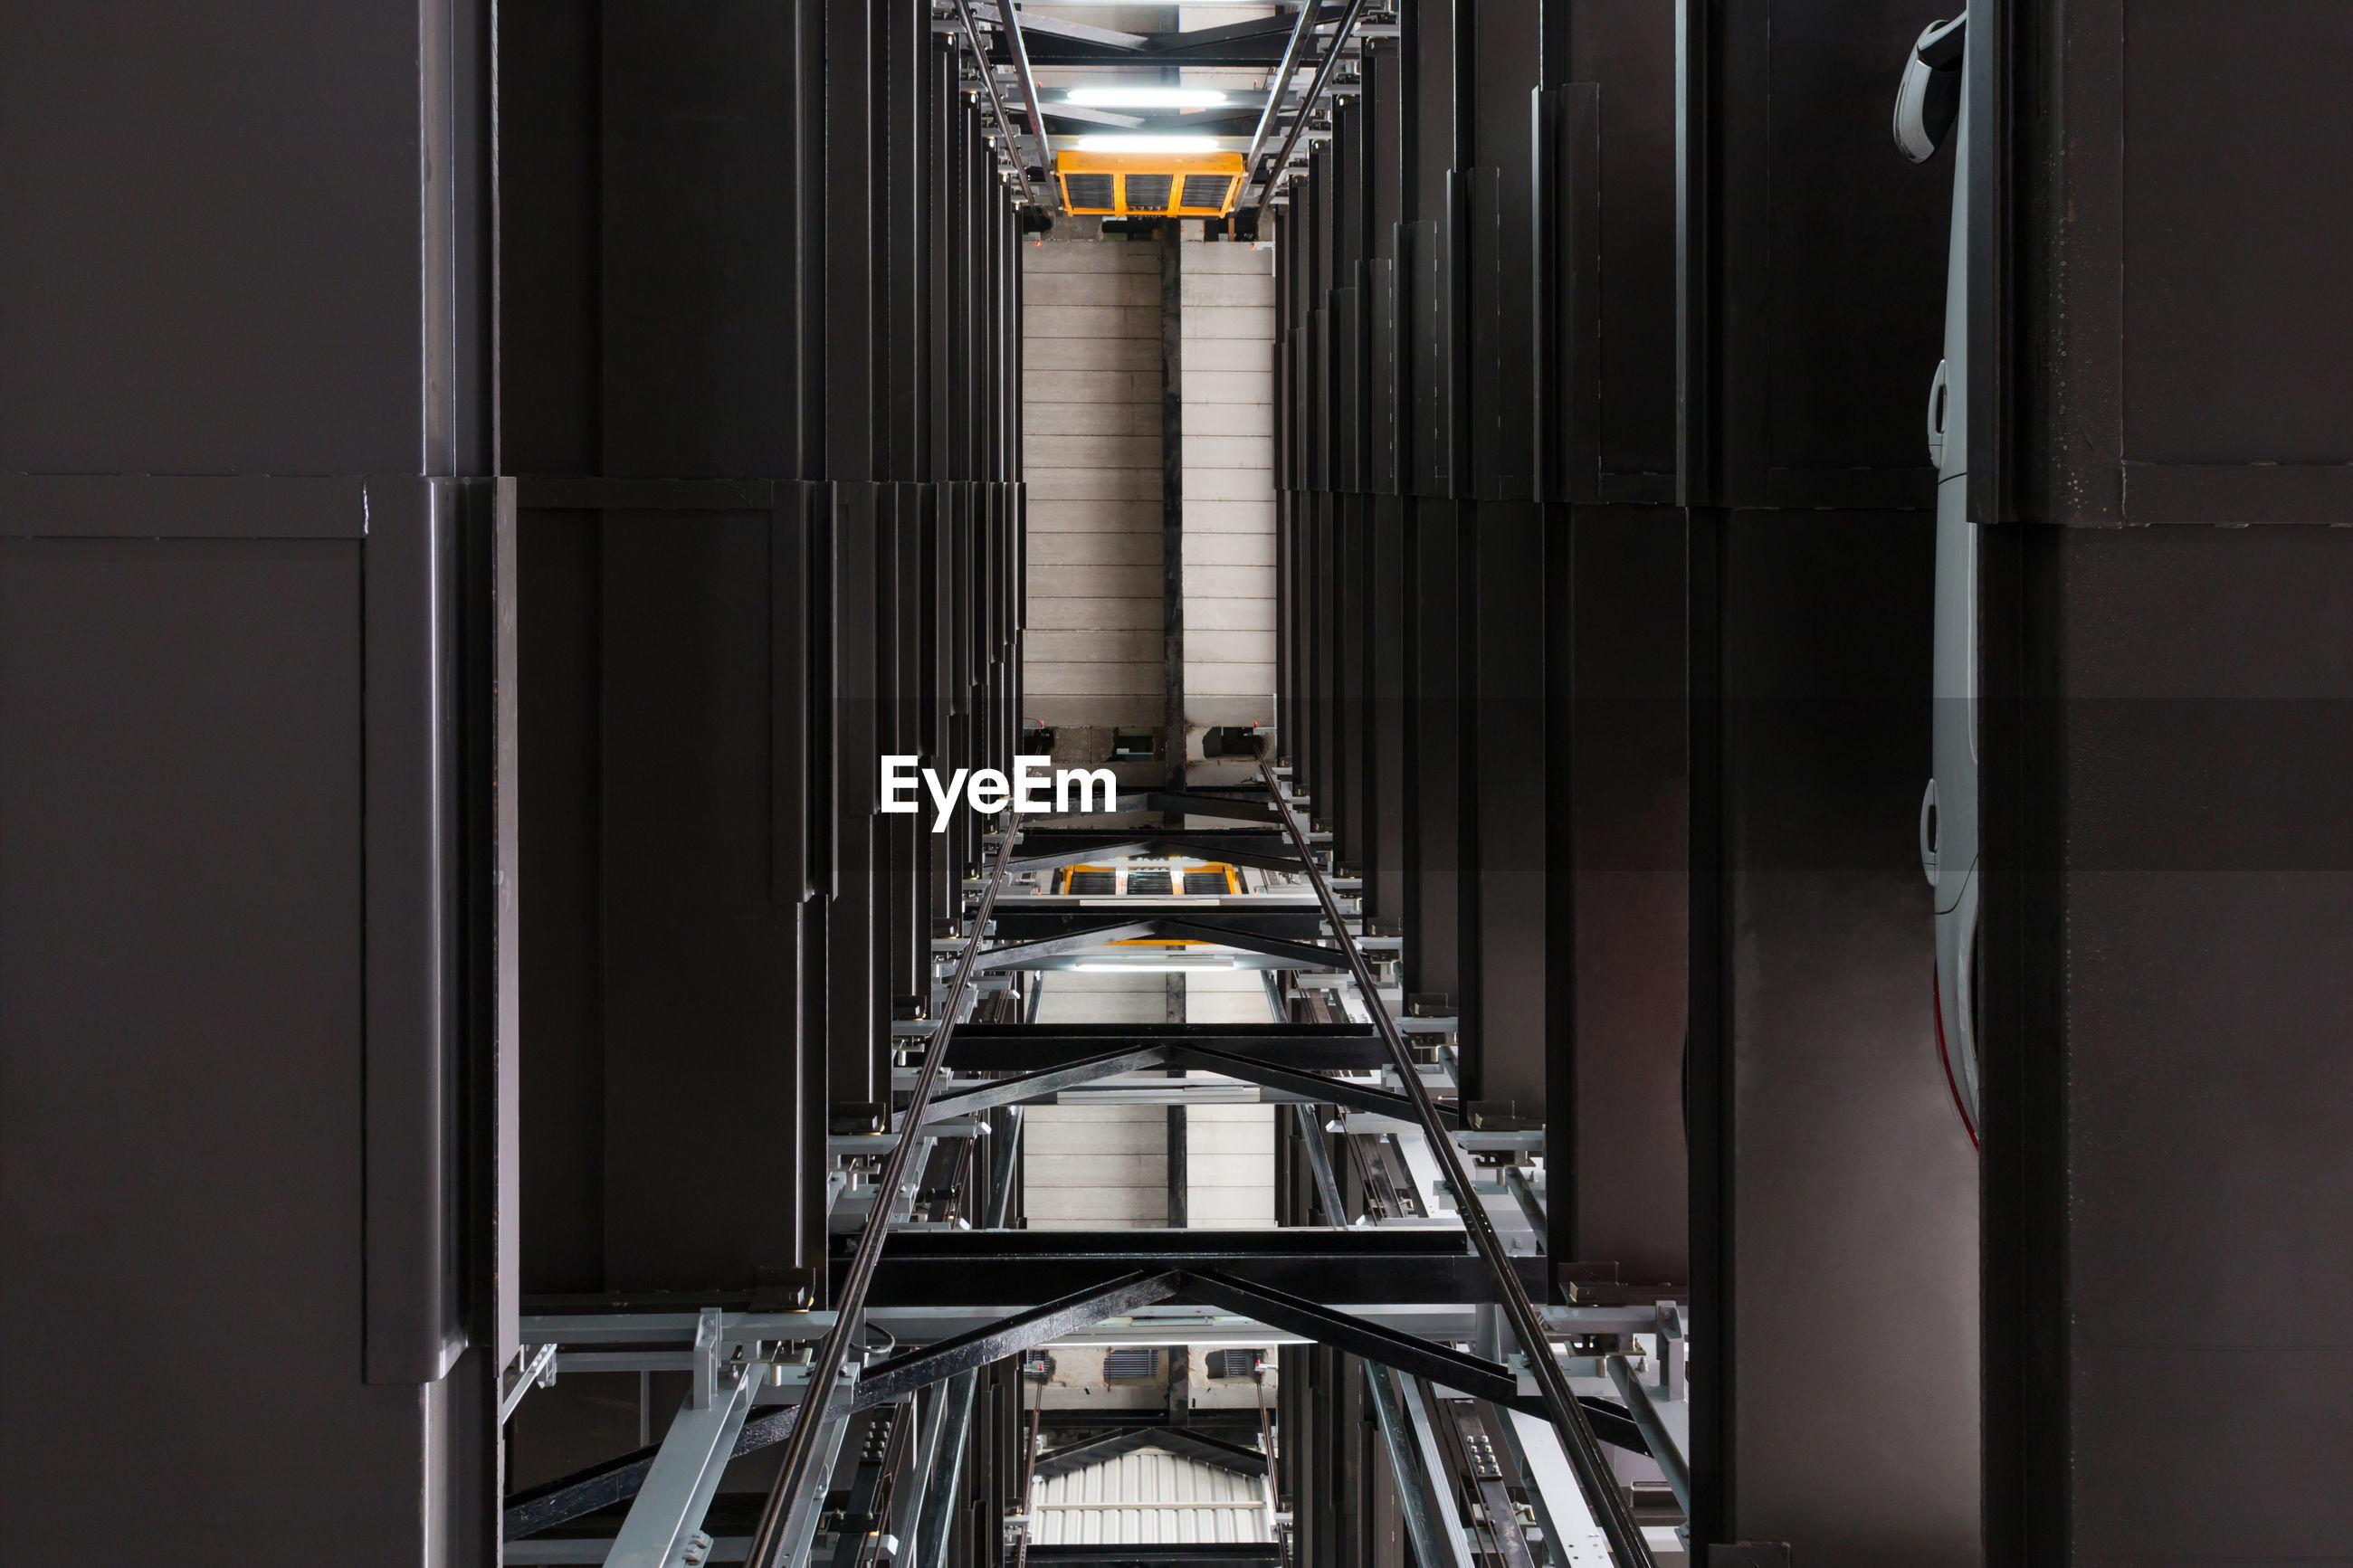 Directly below shot of hydraulic platform